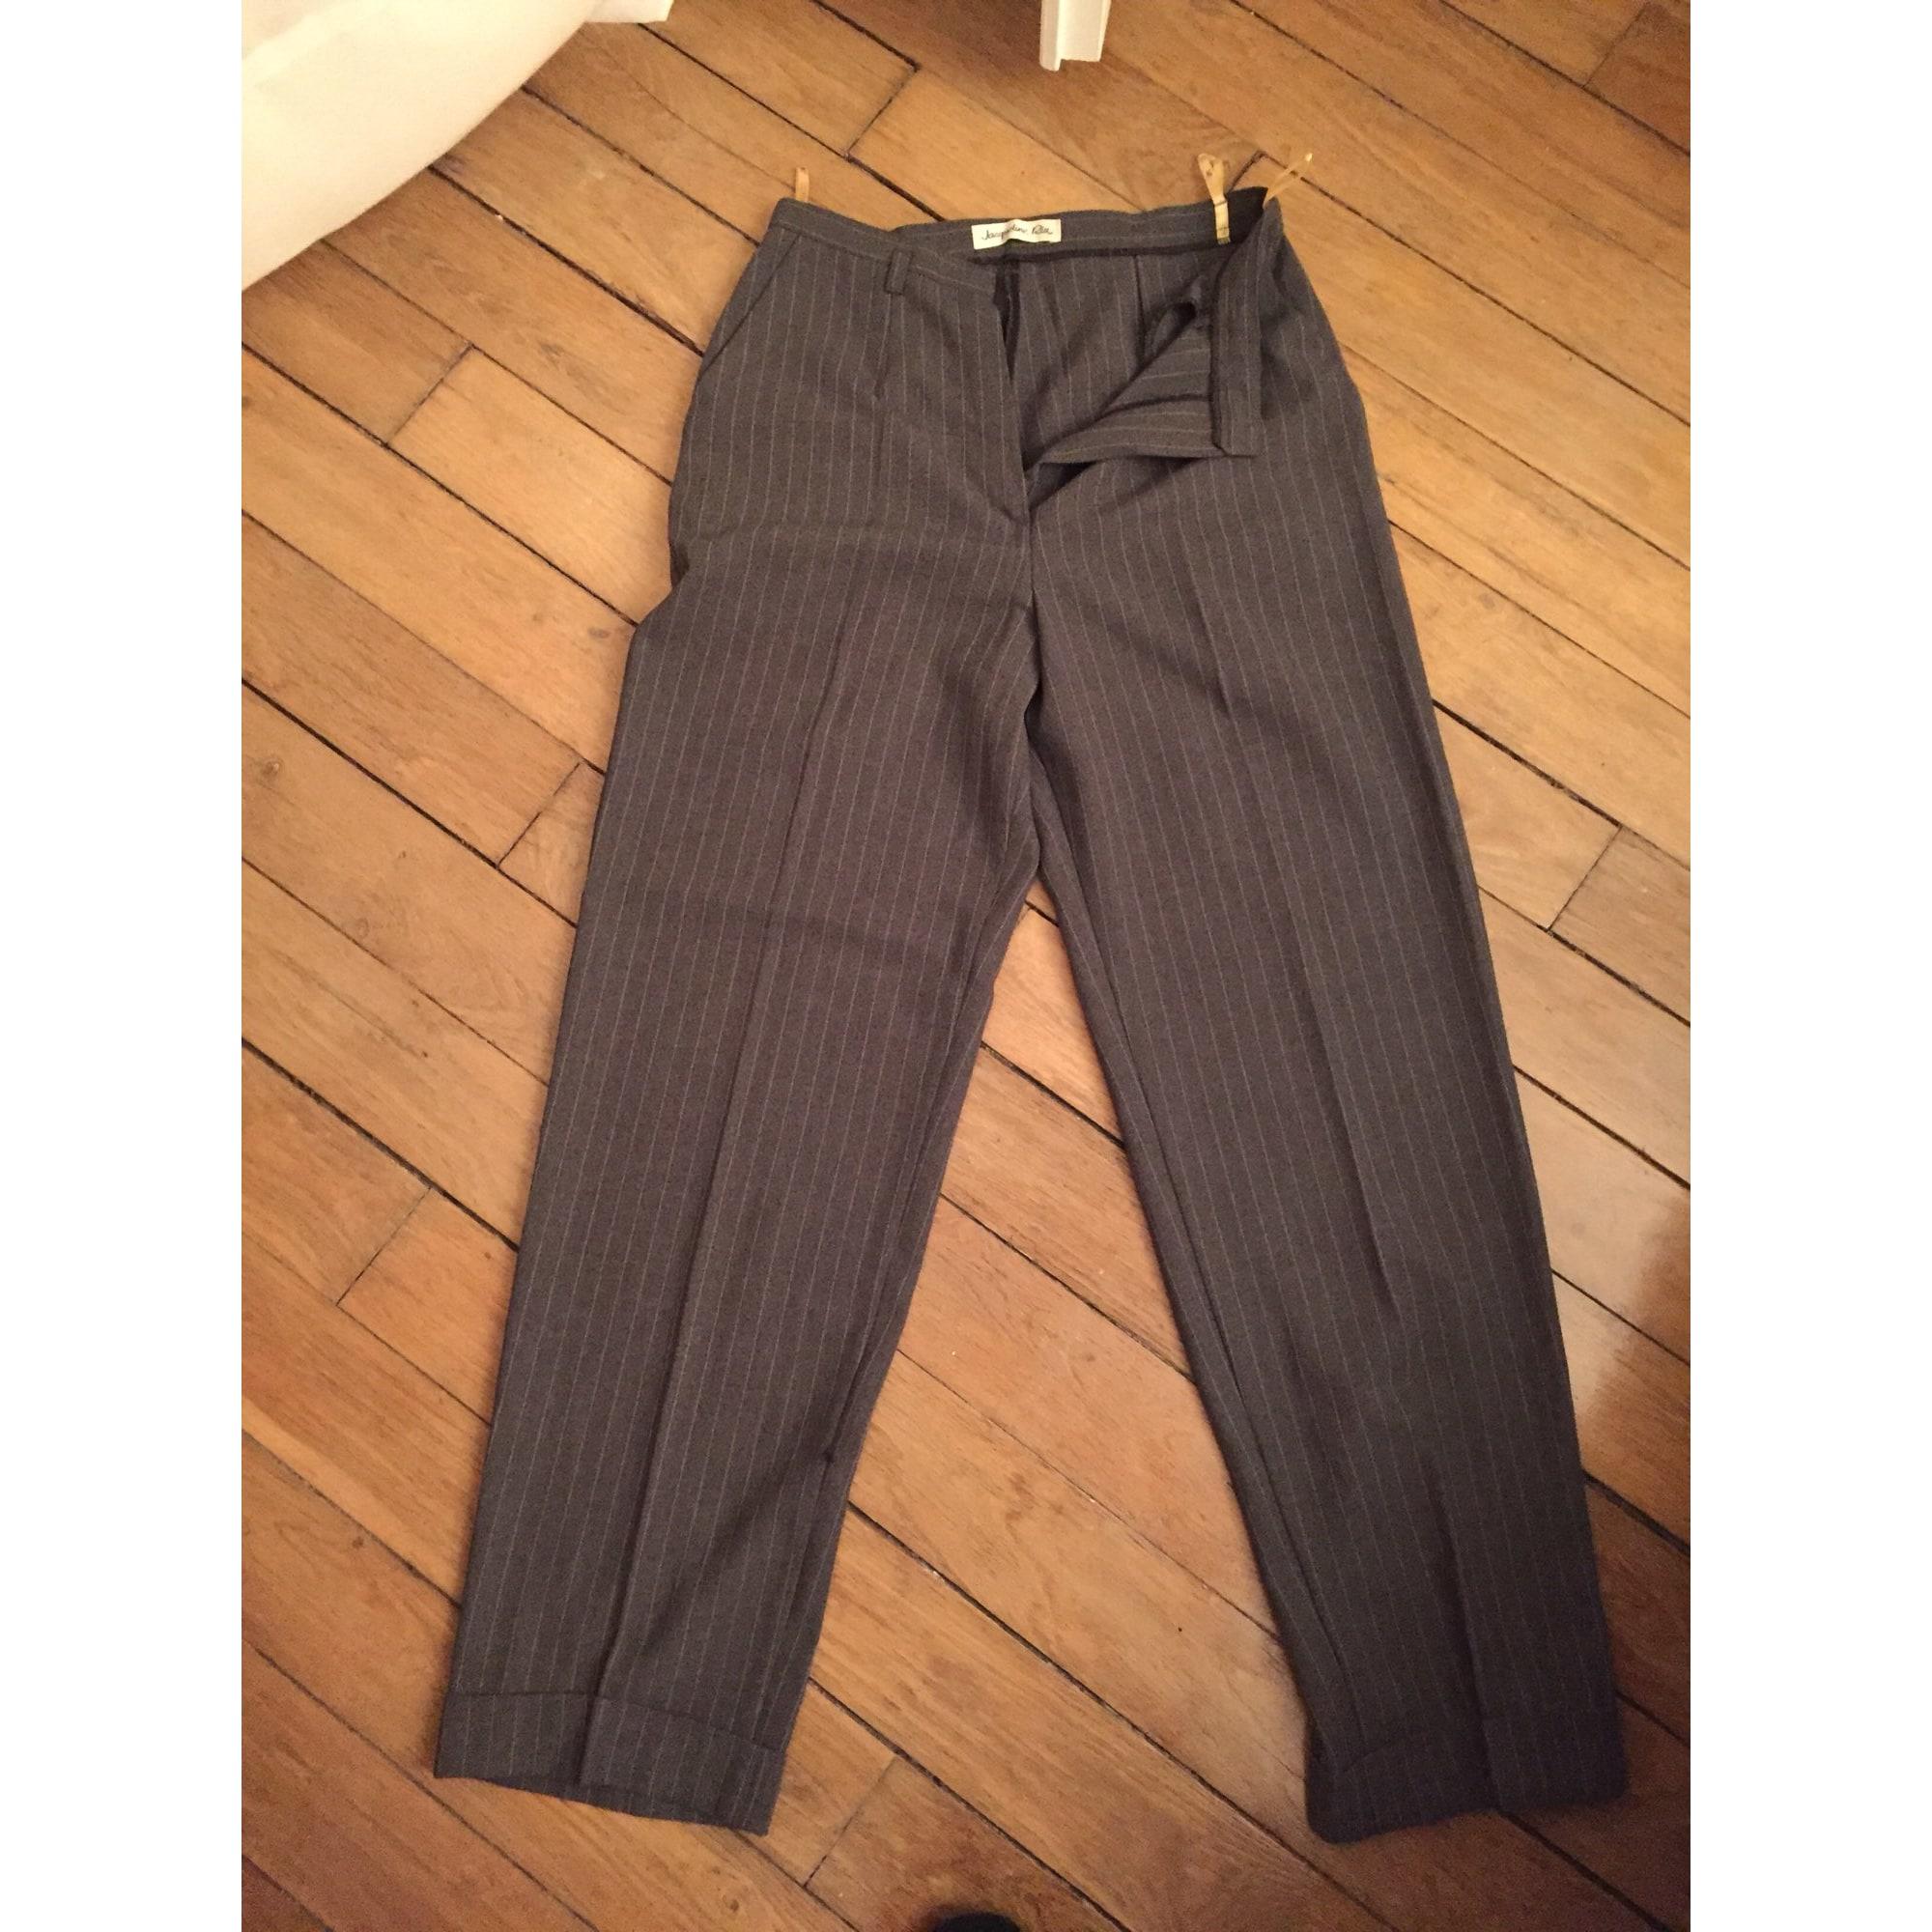 Pantalon droit UNITED COLORS OF BENETTON Marron